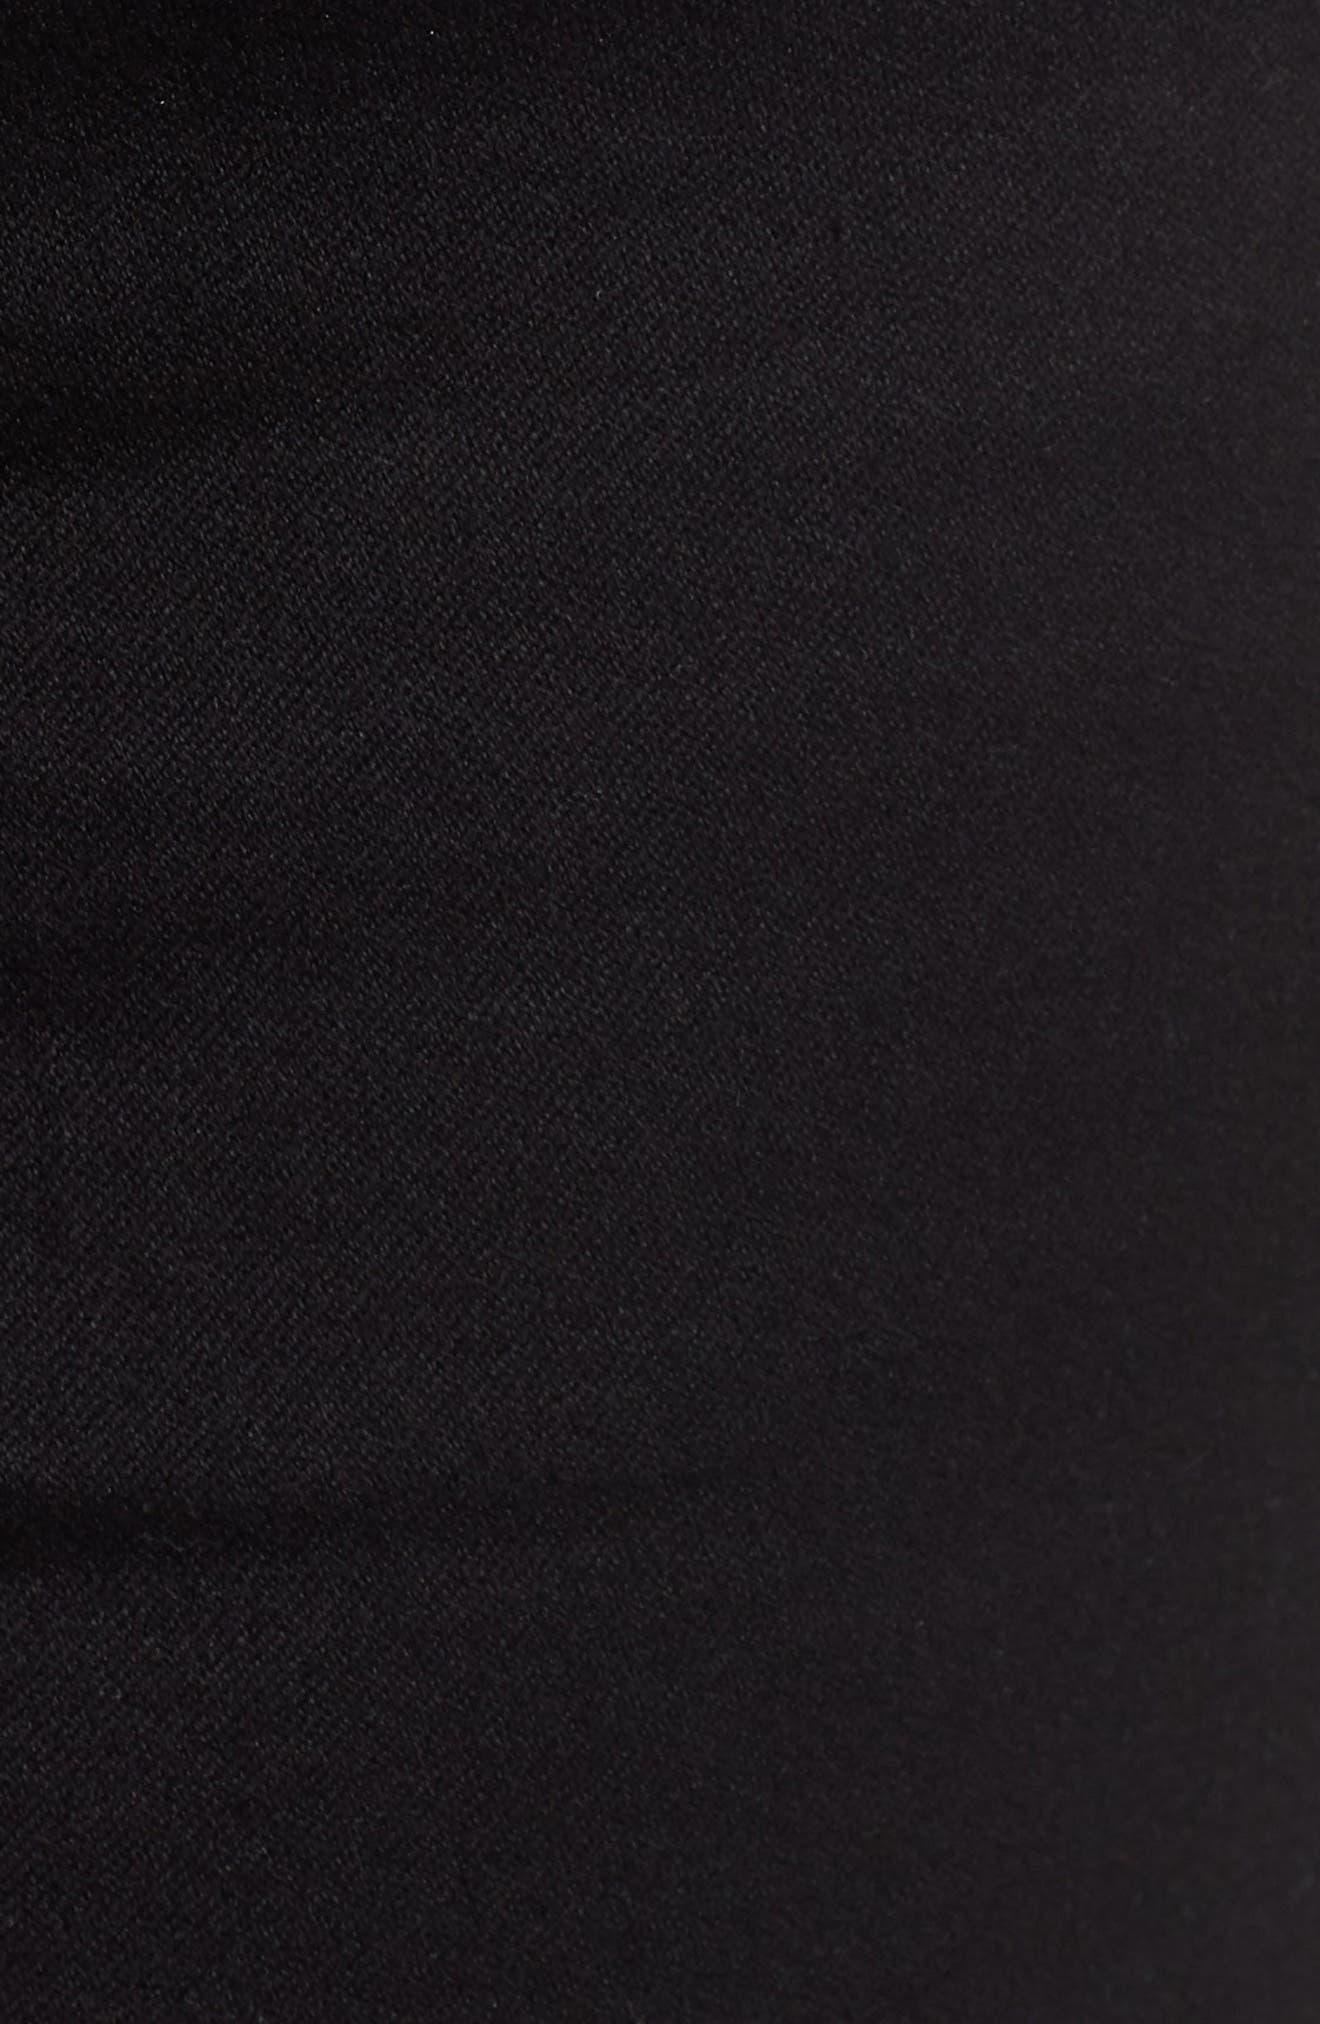 Butter Denim Shorts,                             Alternate thumbnail 6, color,                             001